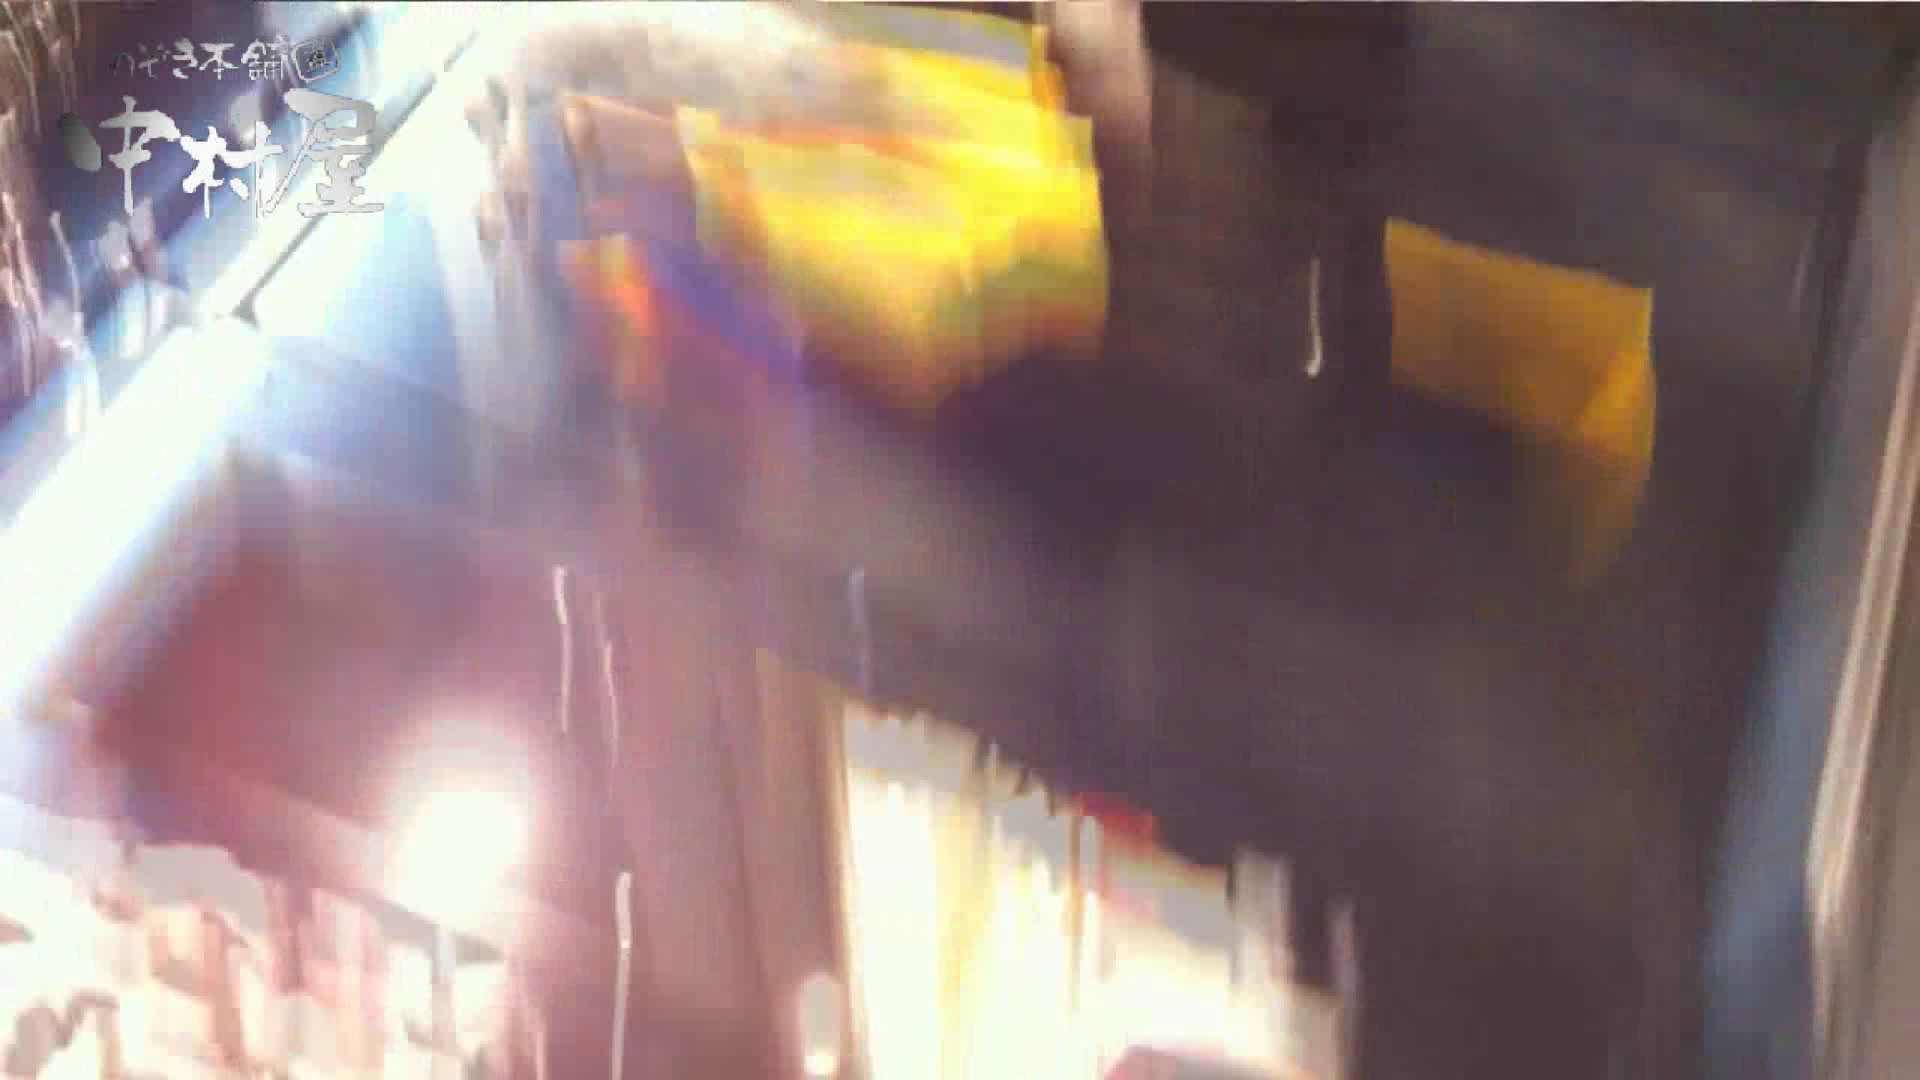 vol.48可愛いカリスマ店員胸チラ&パンチラ アニメ声の店員さん 胸チラ  96Pix 81